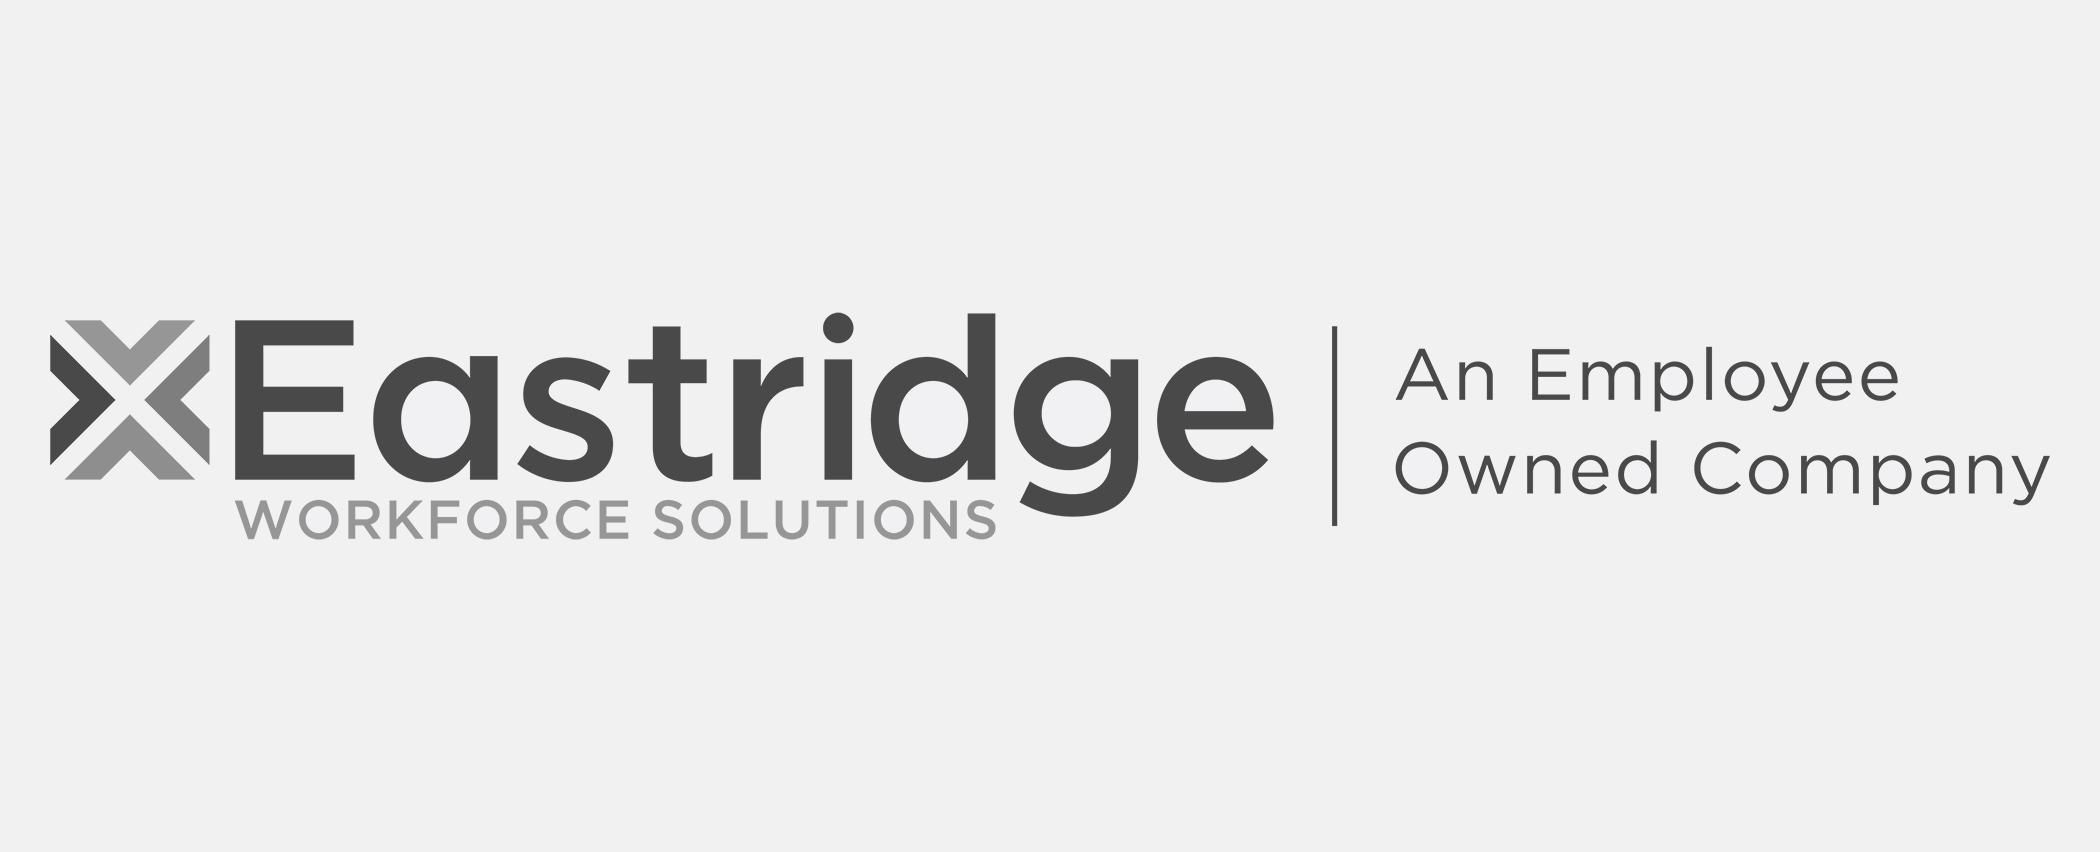 CEO Coaching International congratulates Eastridge Workforce Solutions